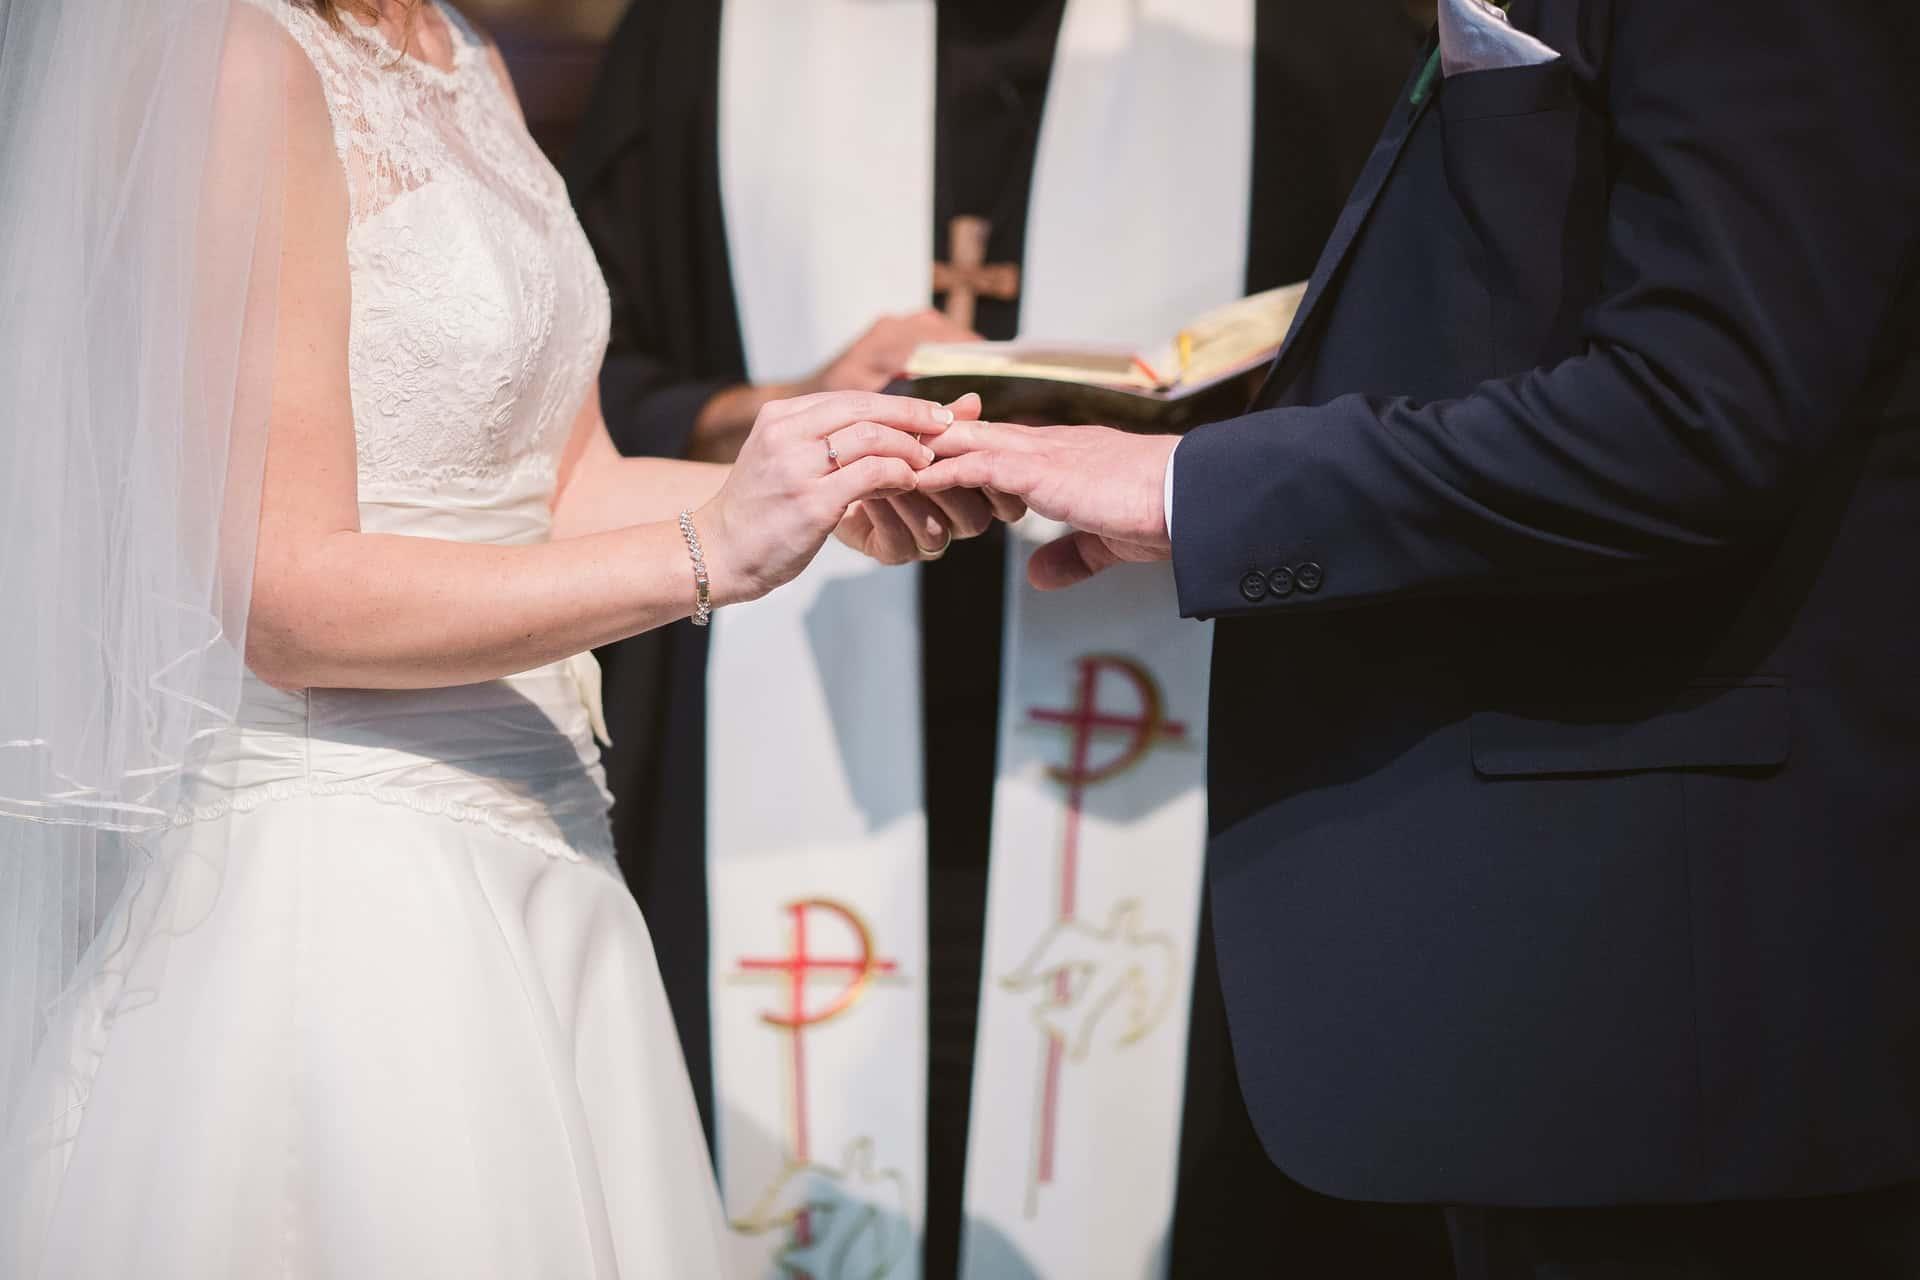 Marriages won't last